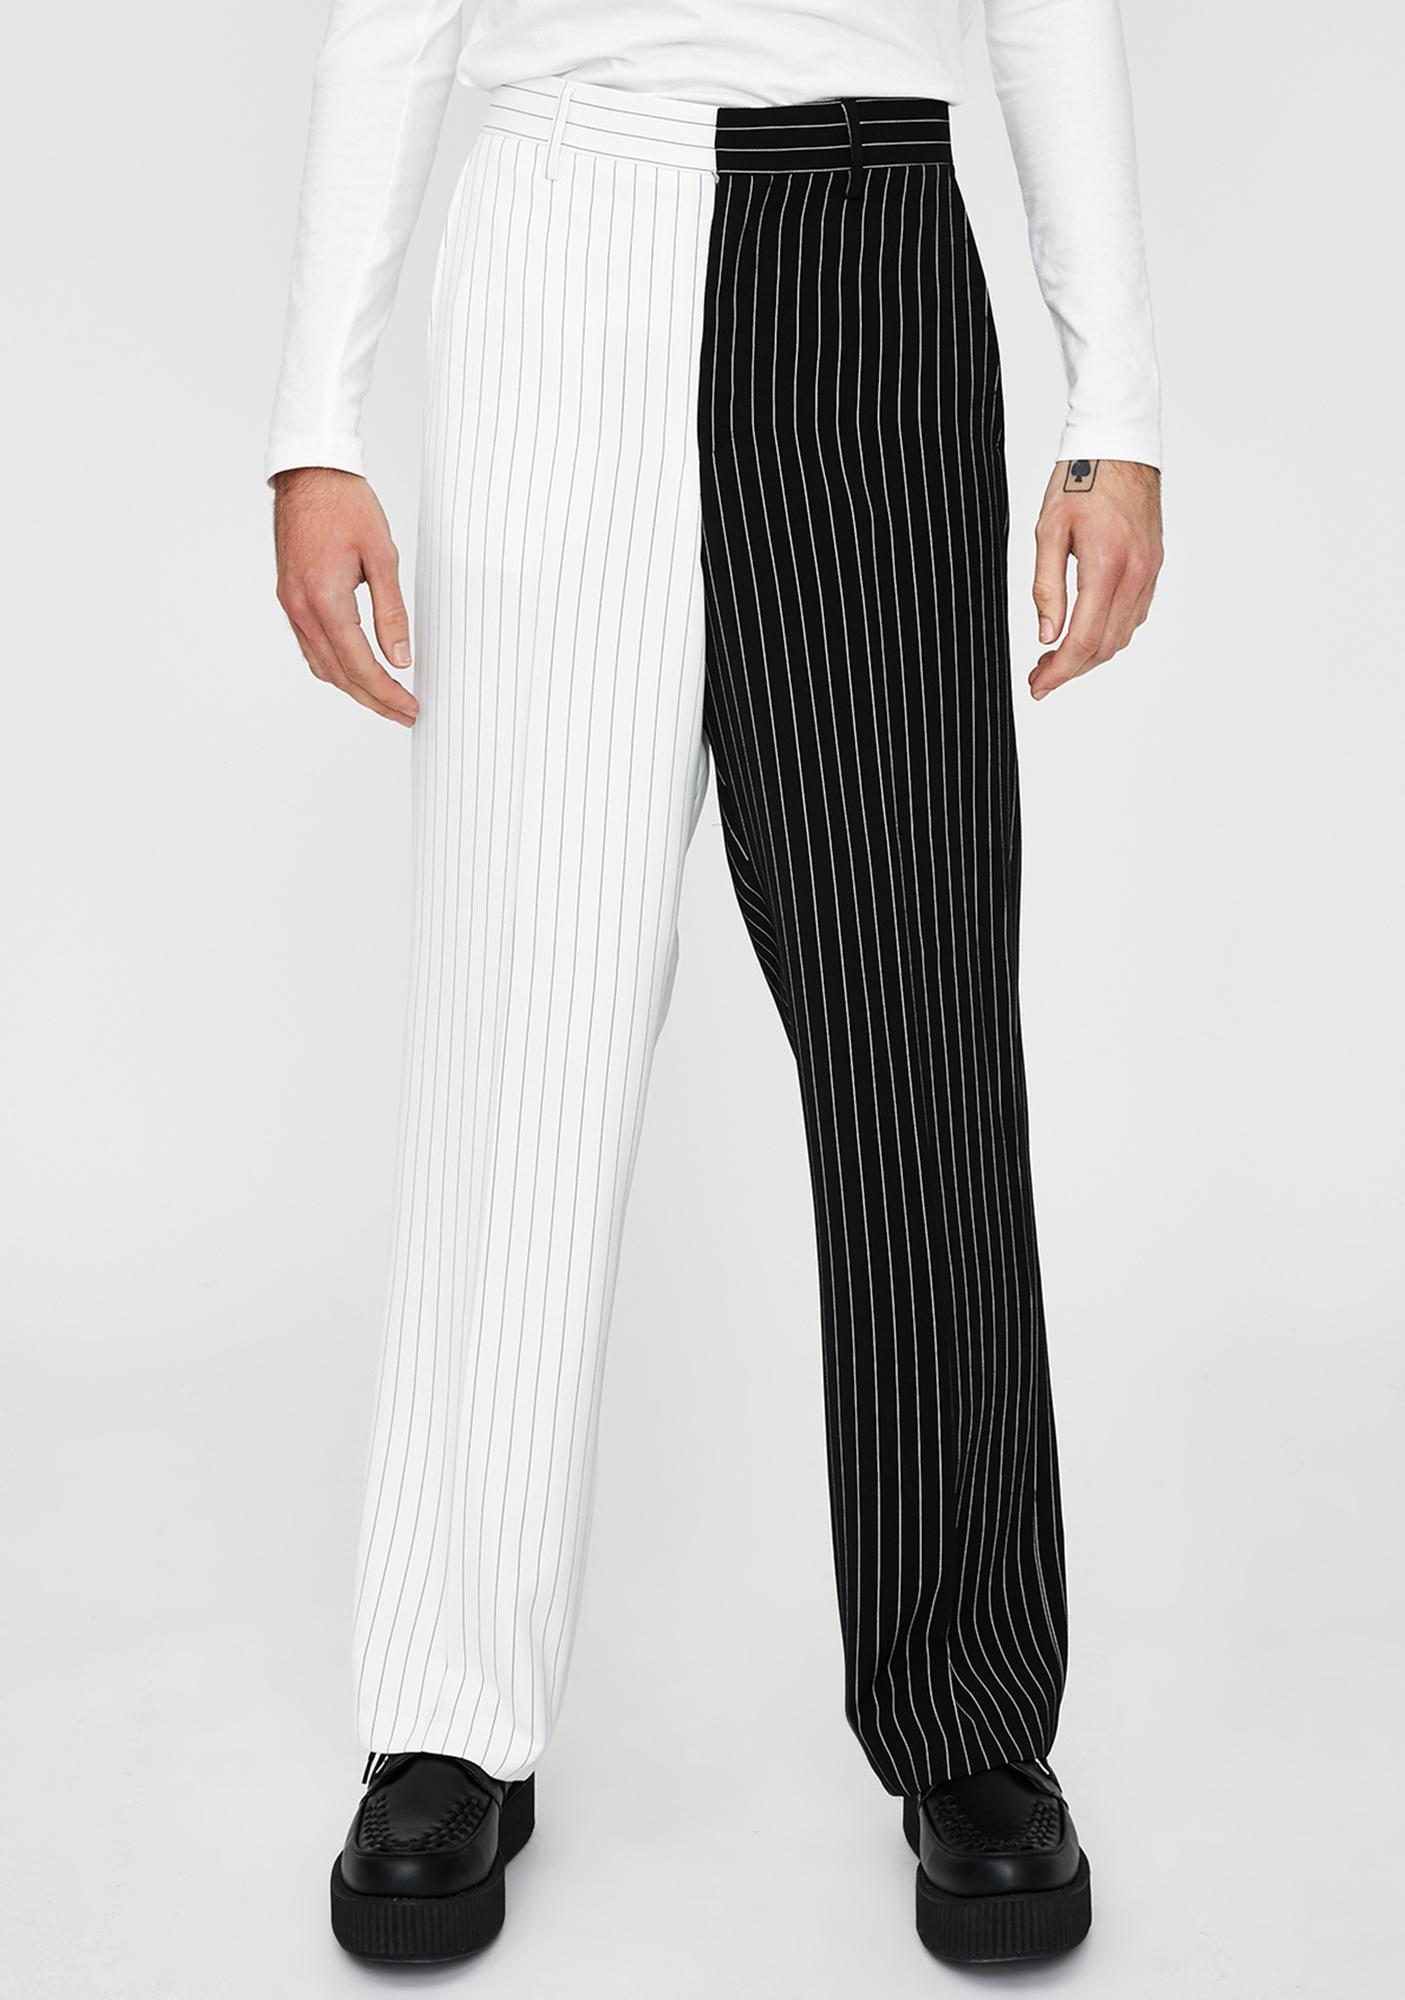 Jaded London Spliced Black & White Suit Trousers